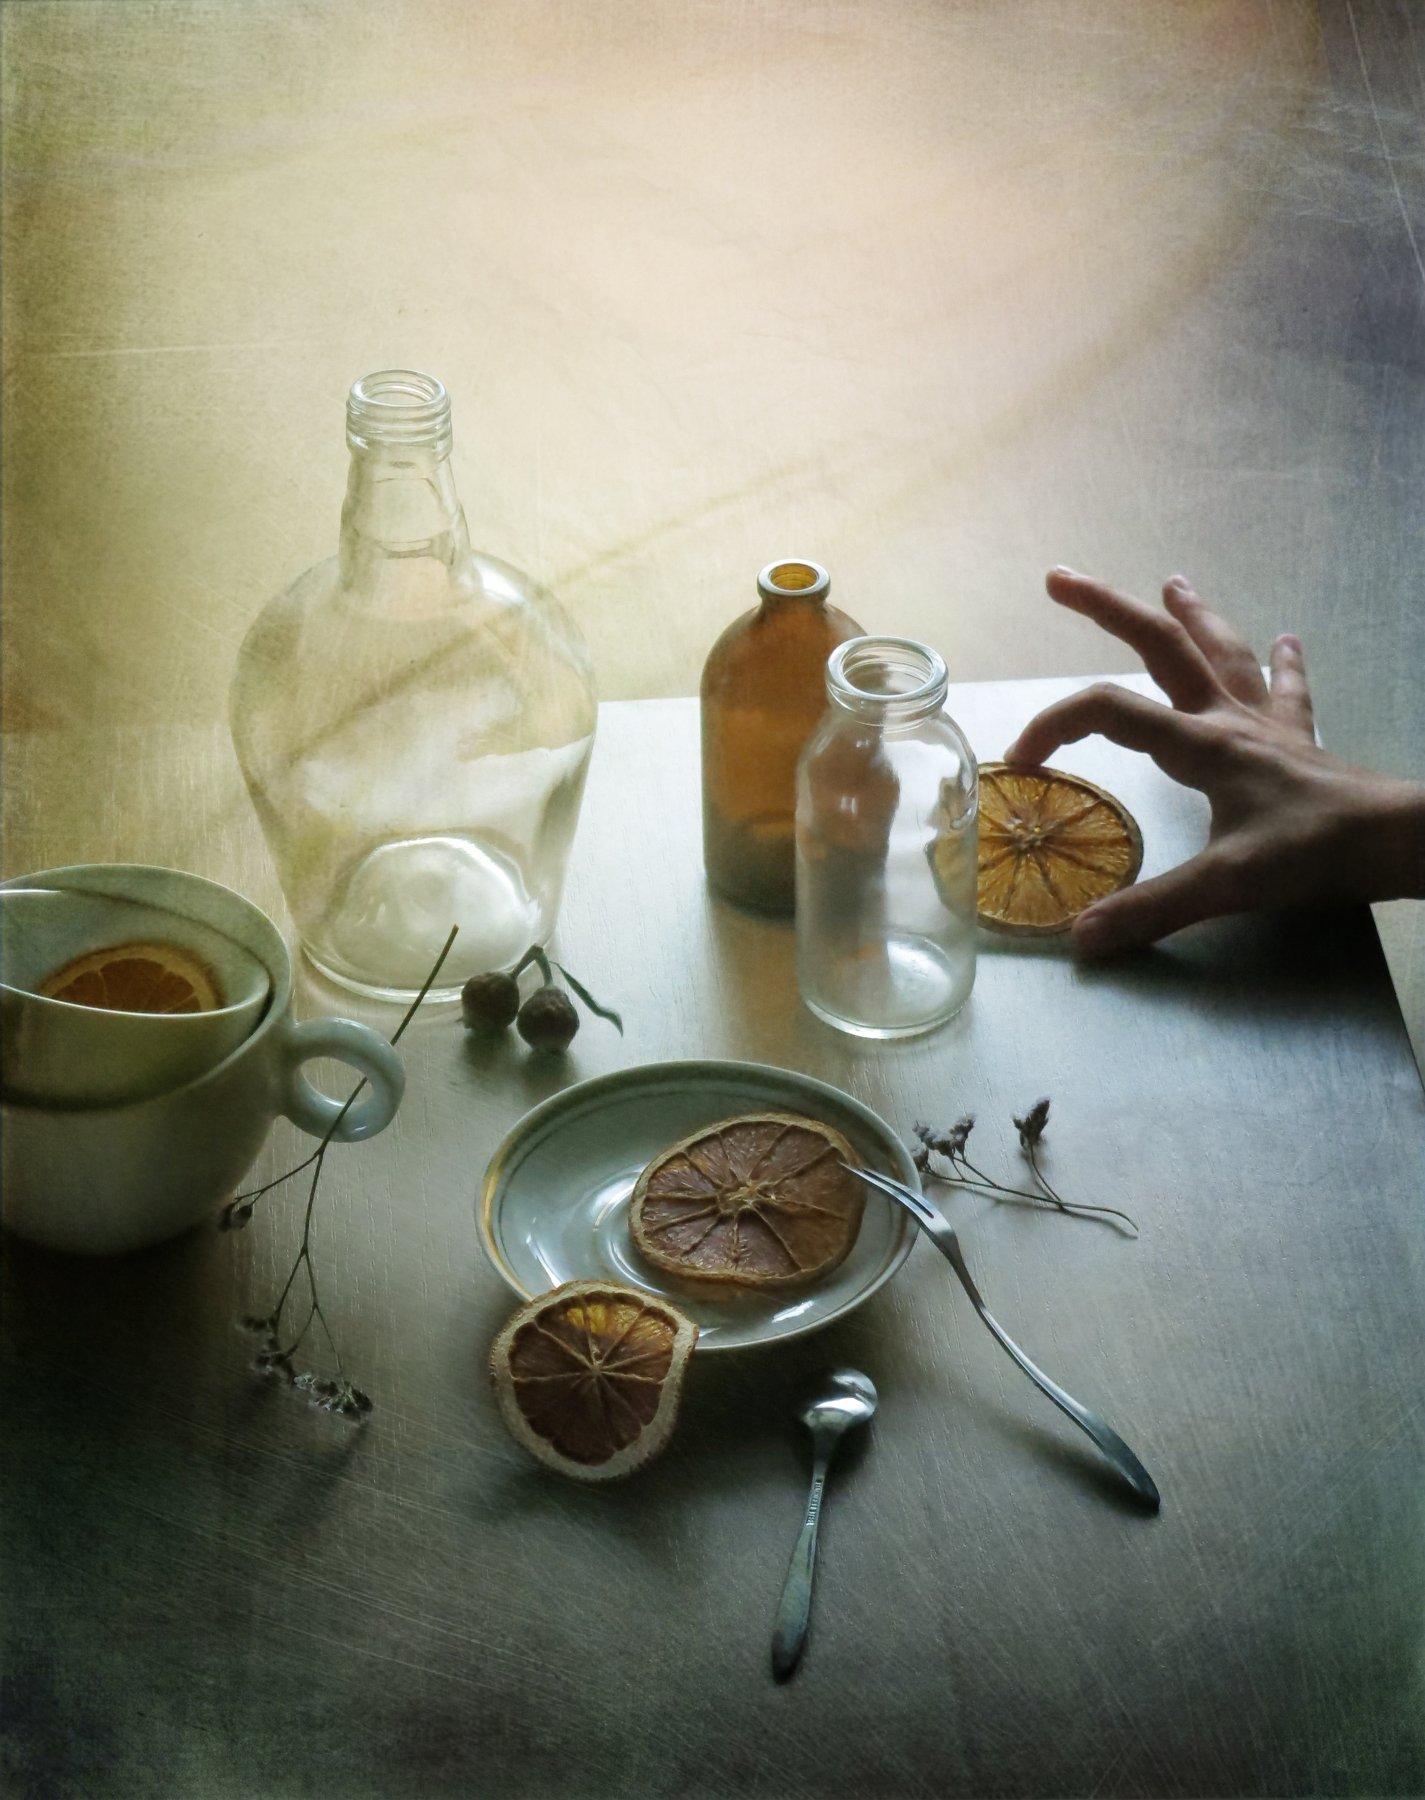 апельсин, посуда, натюрморт, травинка, Елена Лысенко